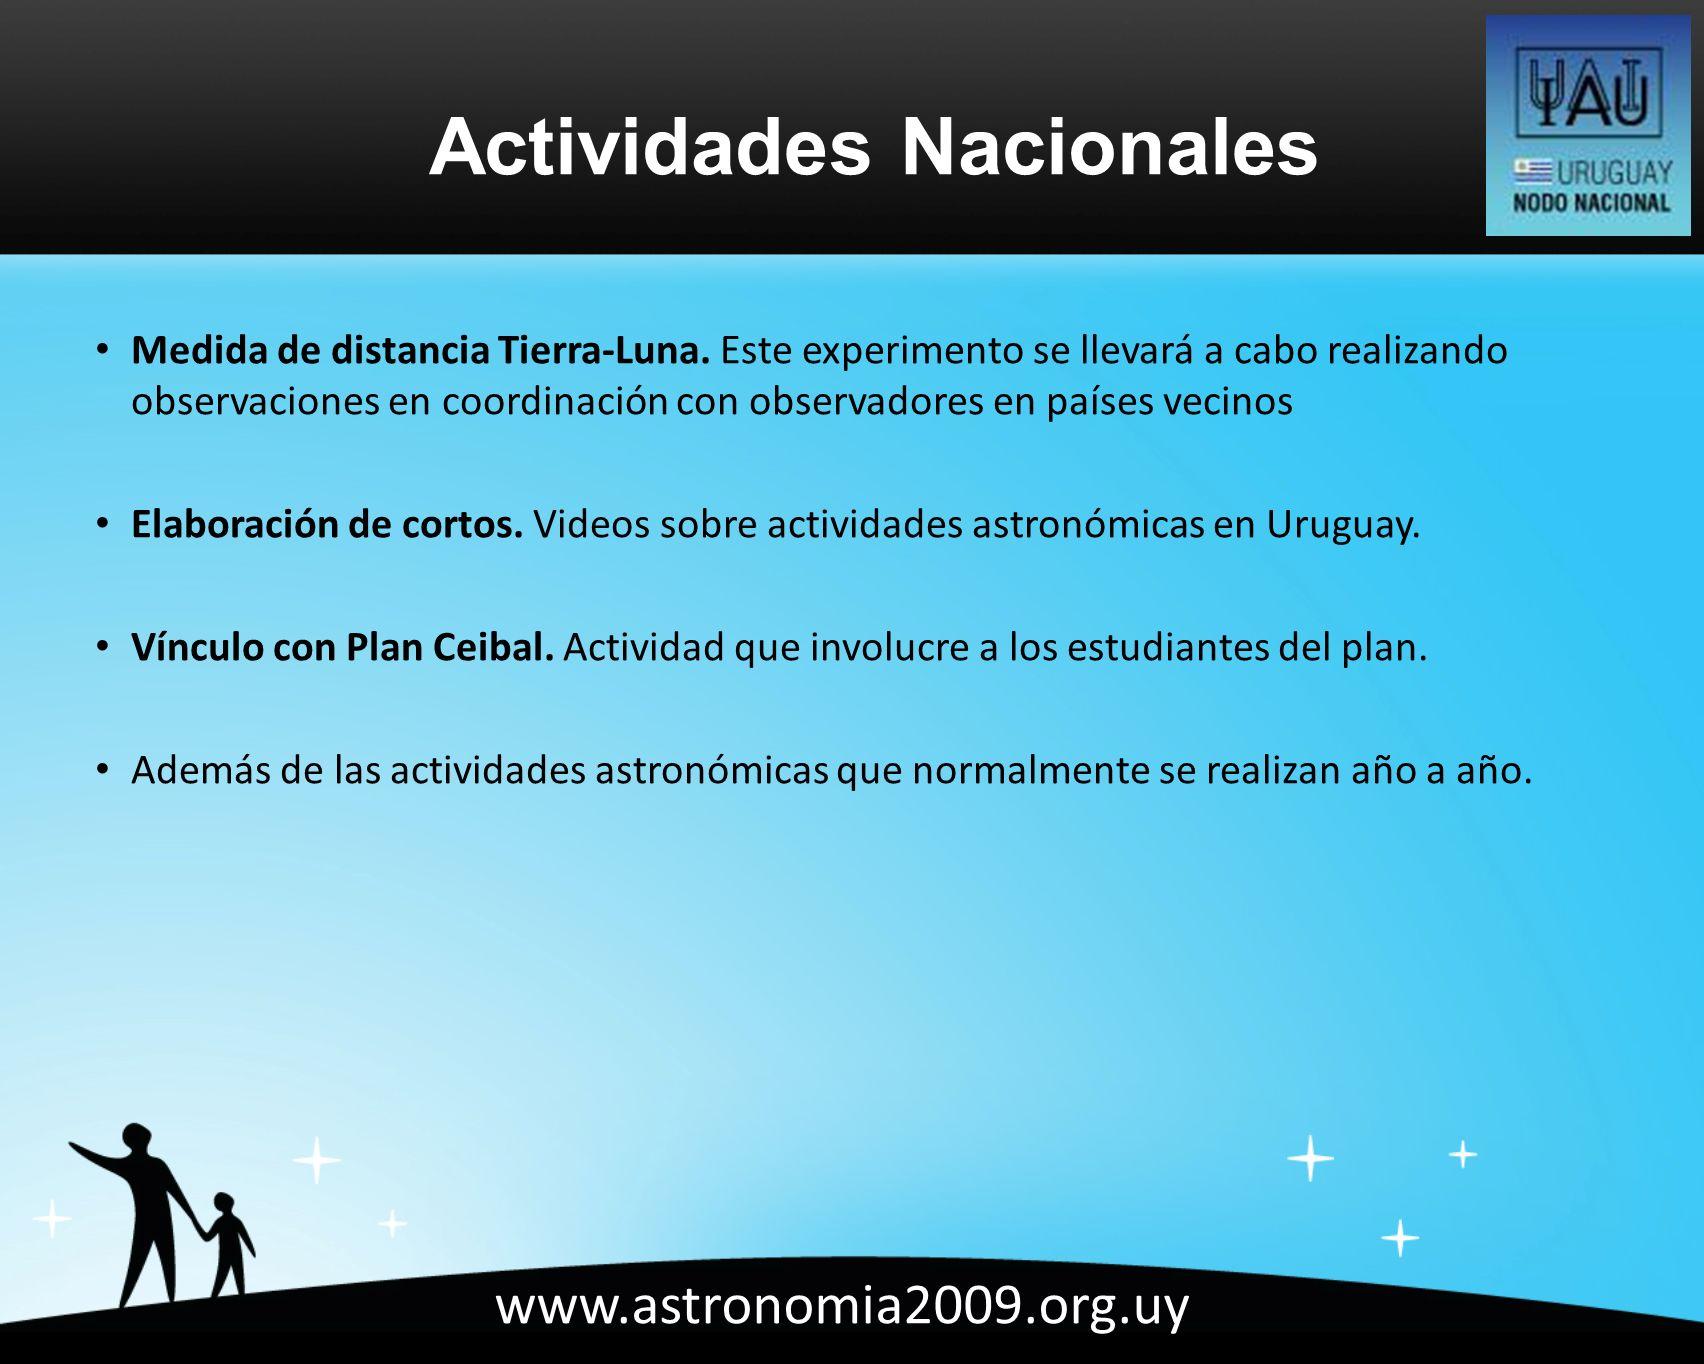 www.astronomia2009.org.uy Medida de distancia Tierra-Luna.